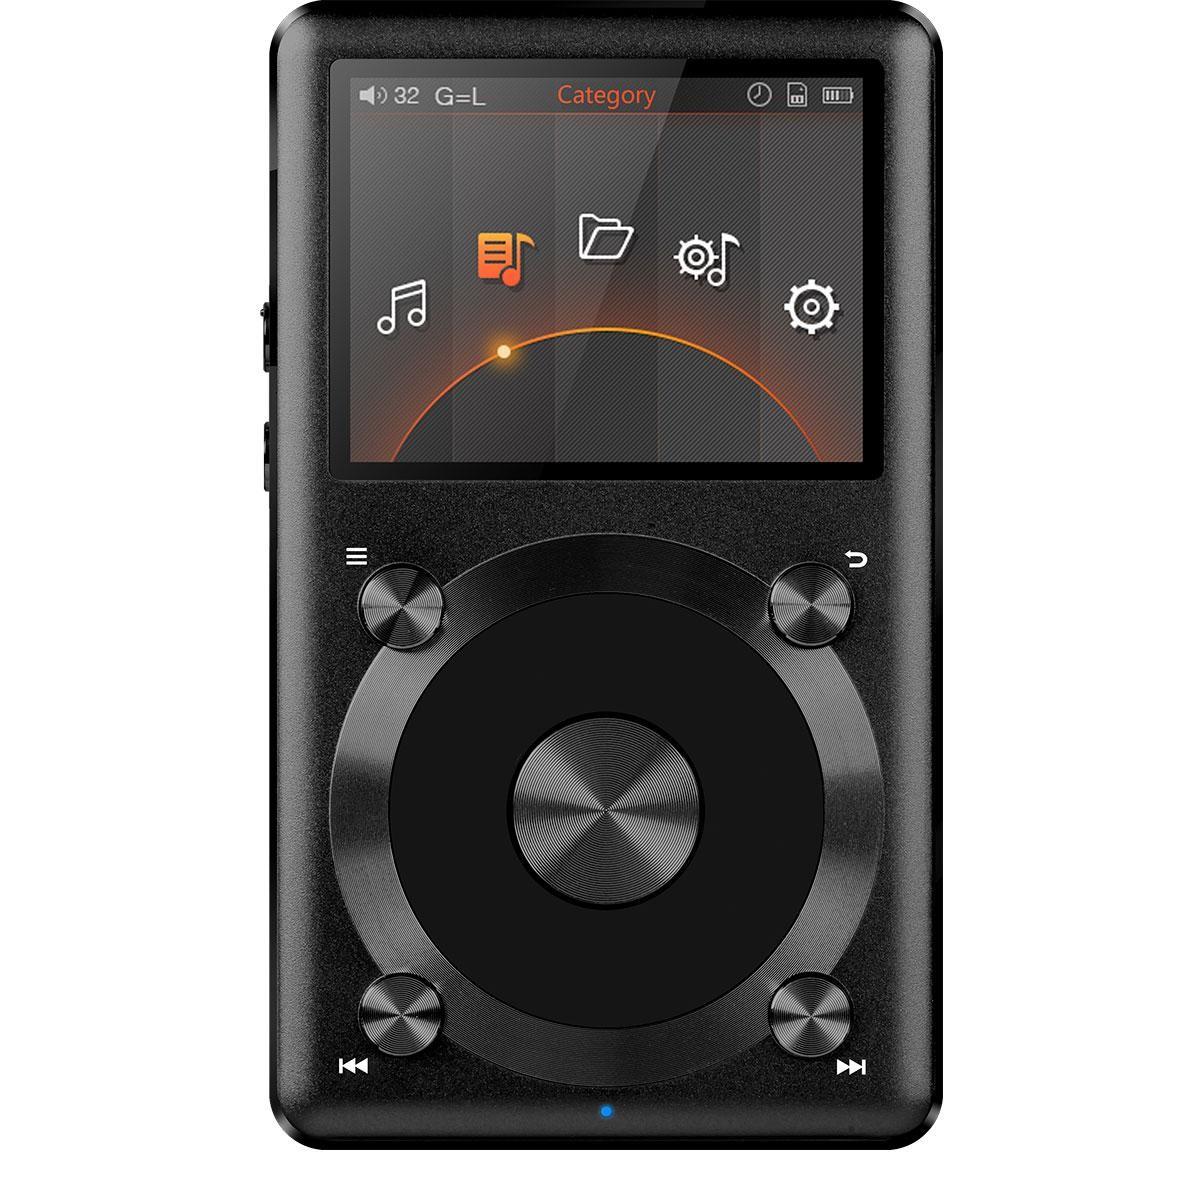 Máy nghe nhạc Fiio X3-II